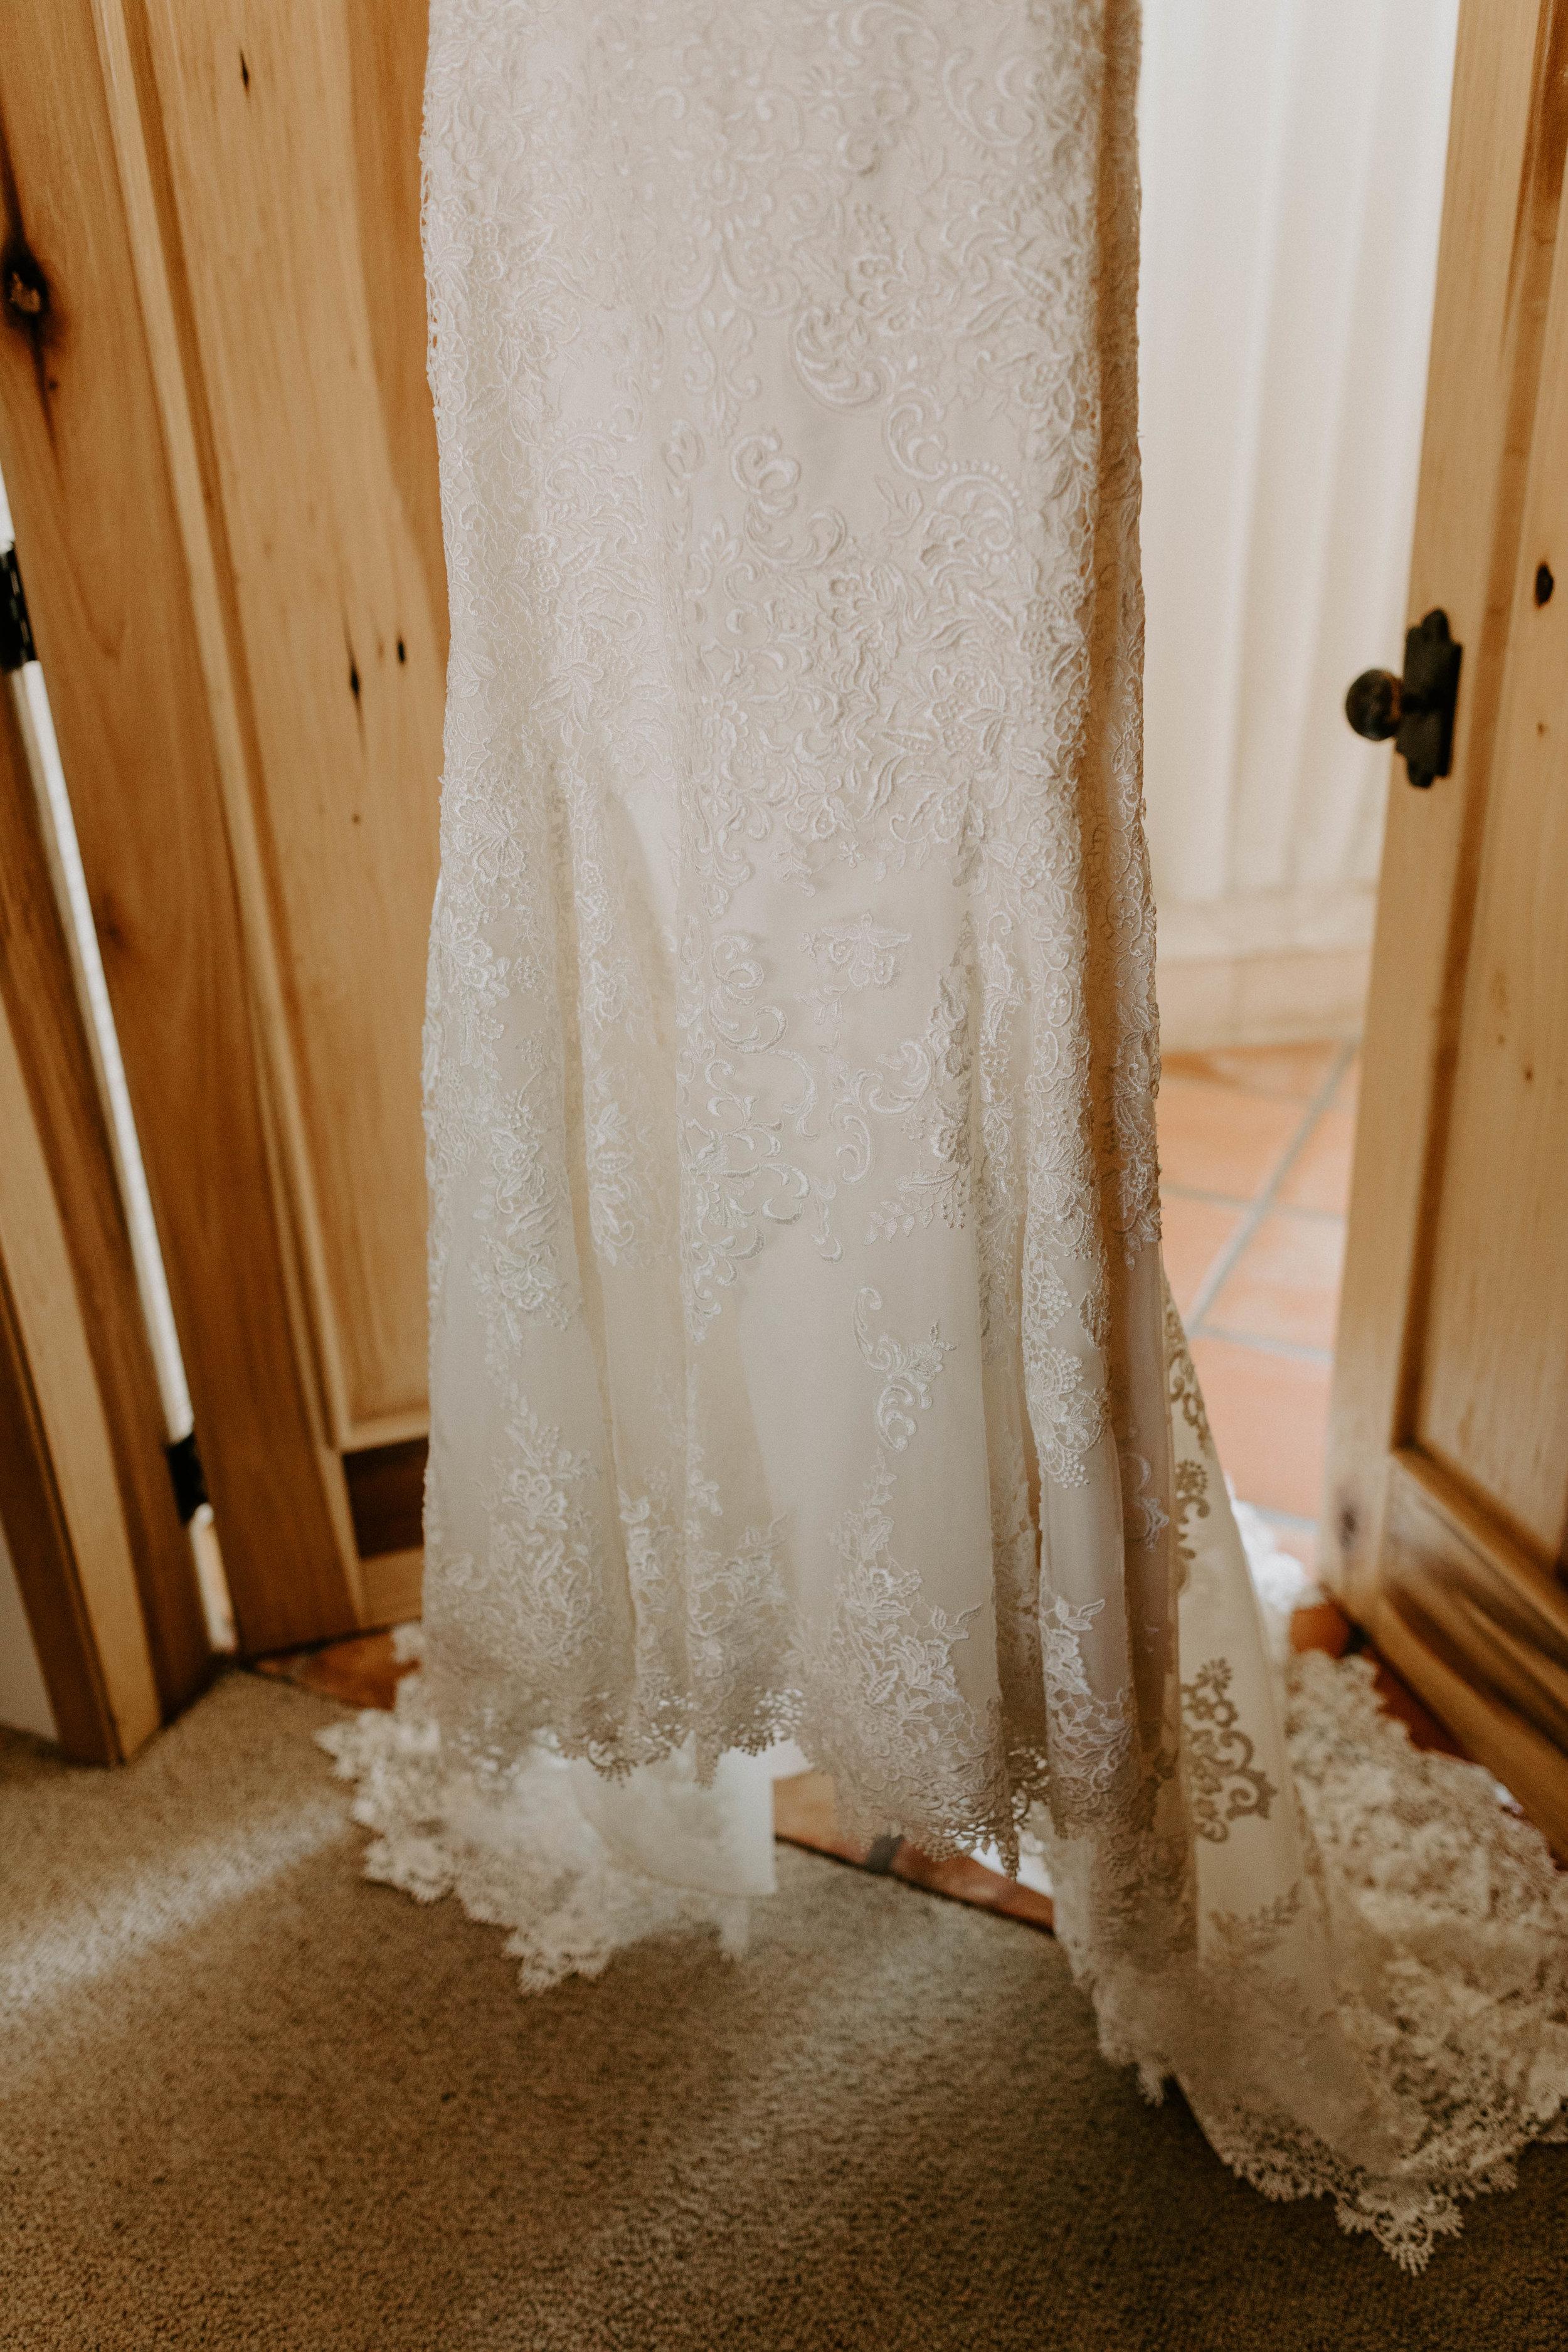 katieandbridgerwedding10.jpg